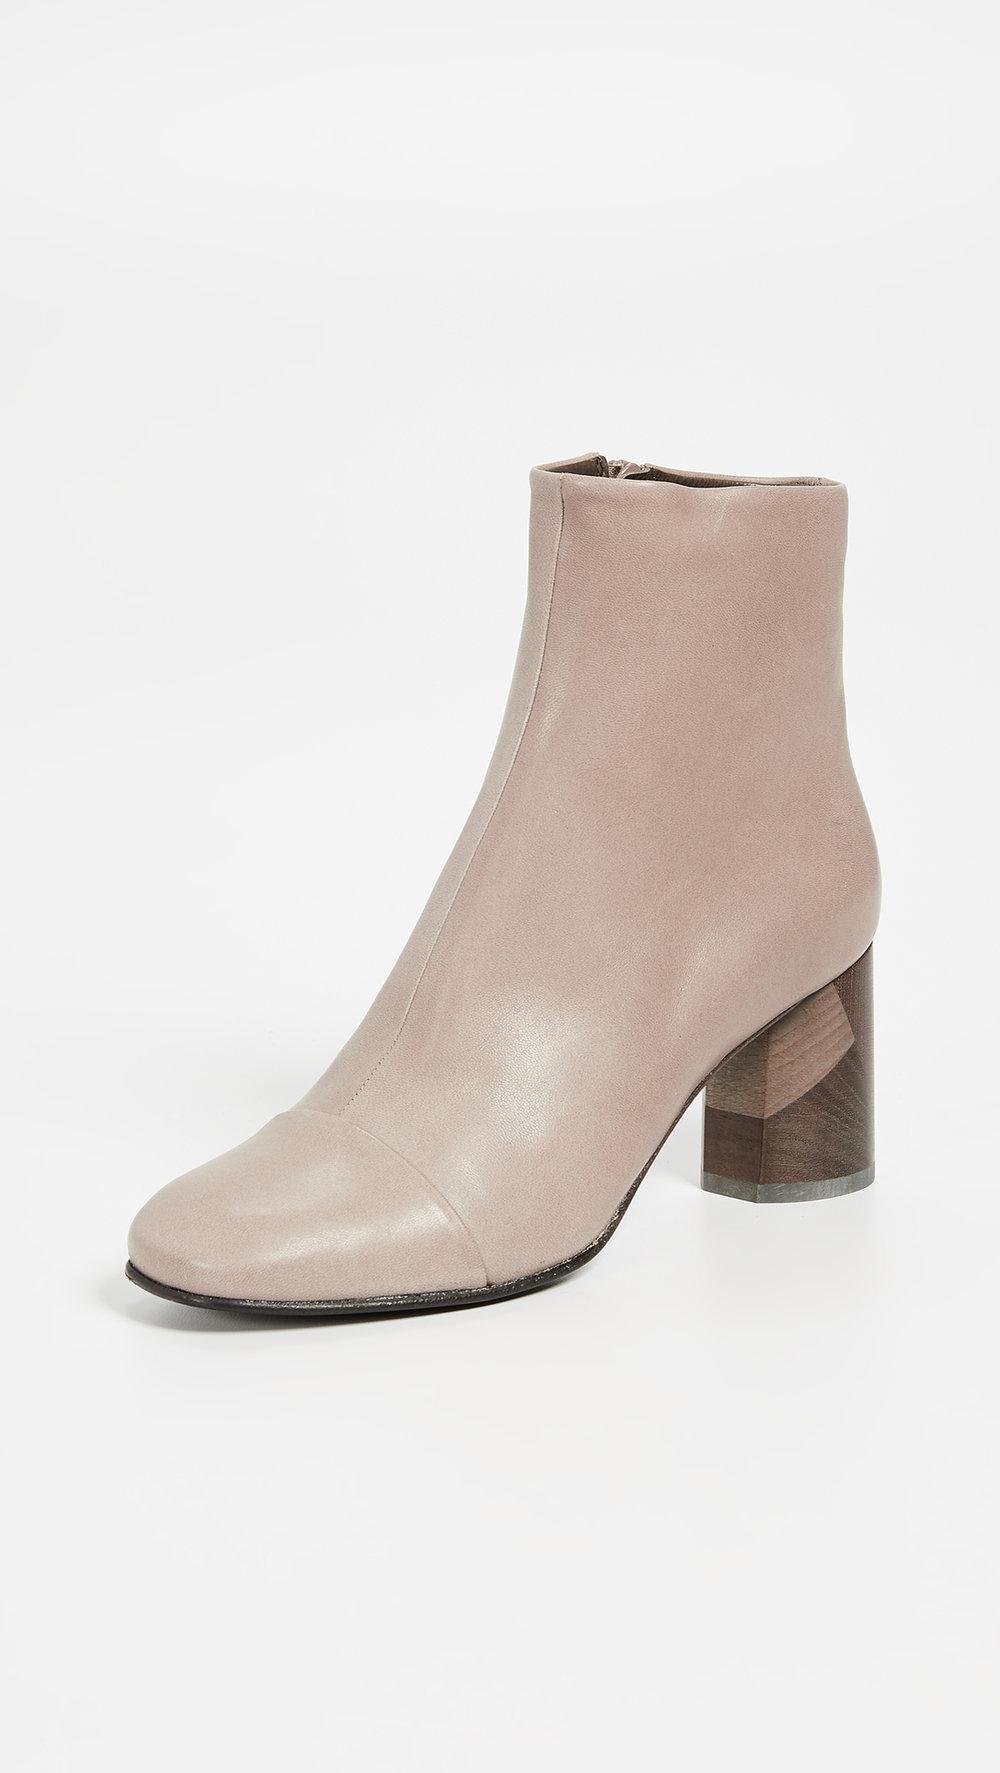 coclico laeve block heel boots